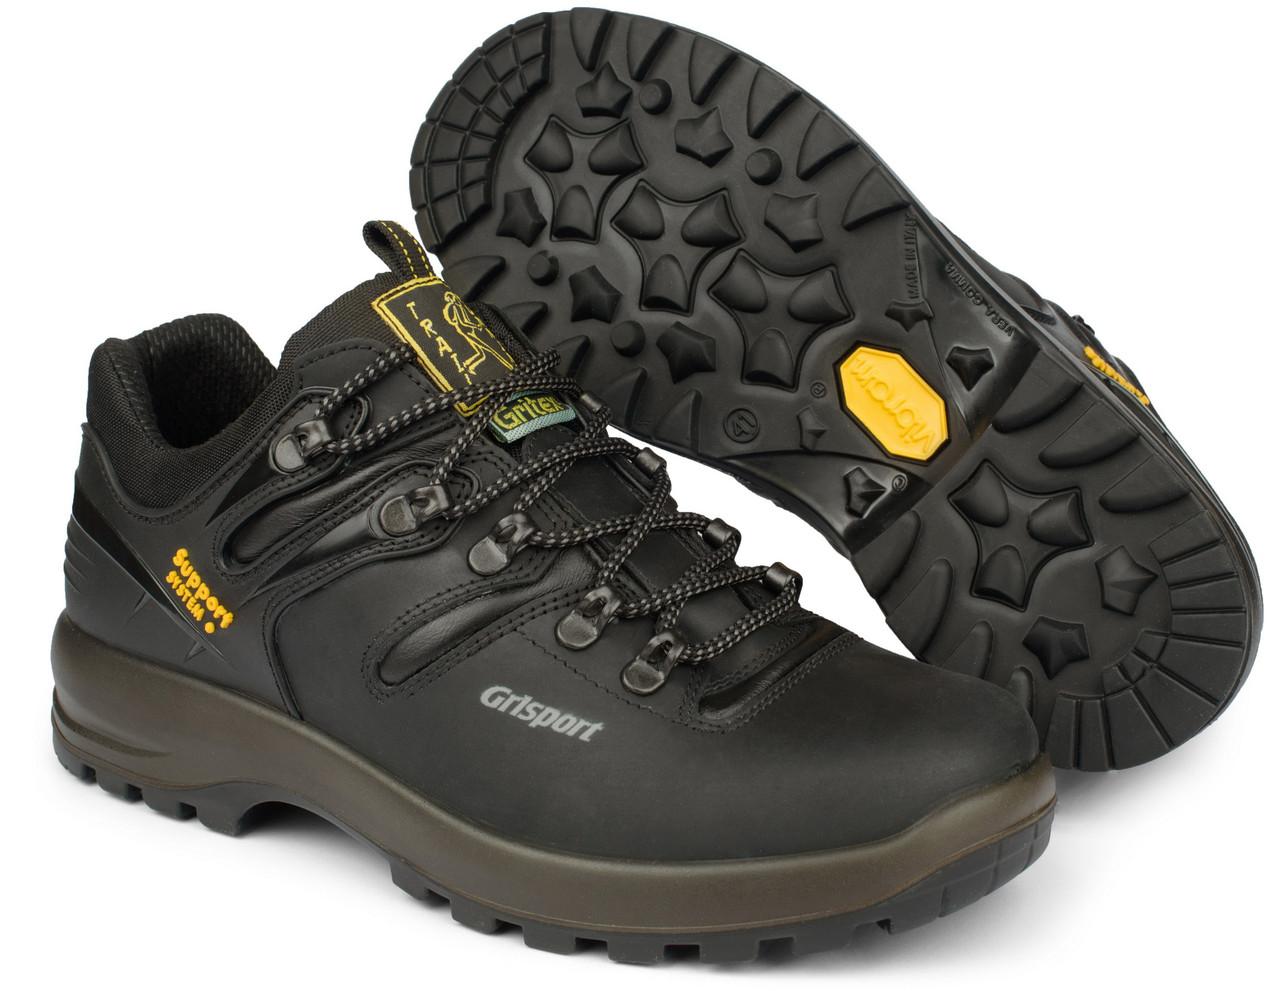 Низкий ботинок Grisport 10003 made in Italy